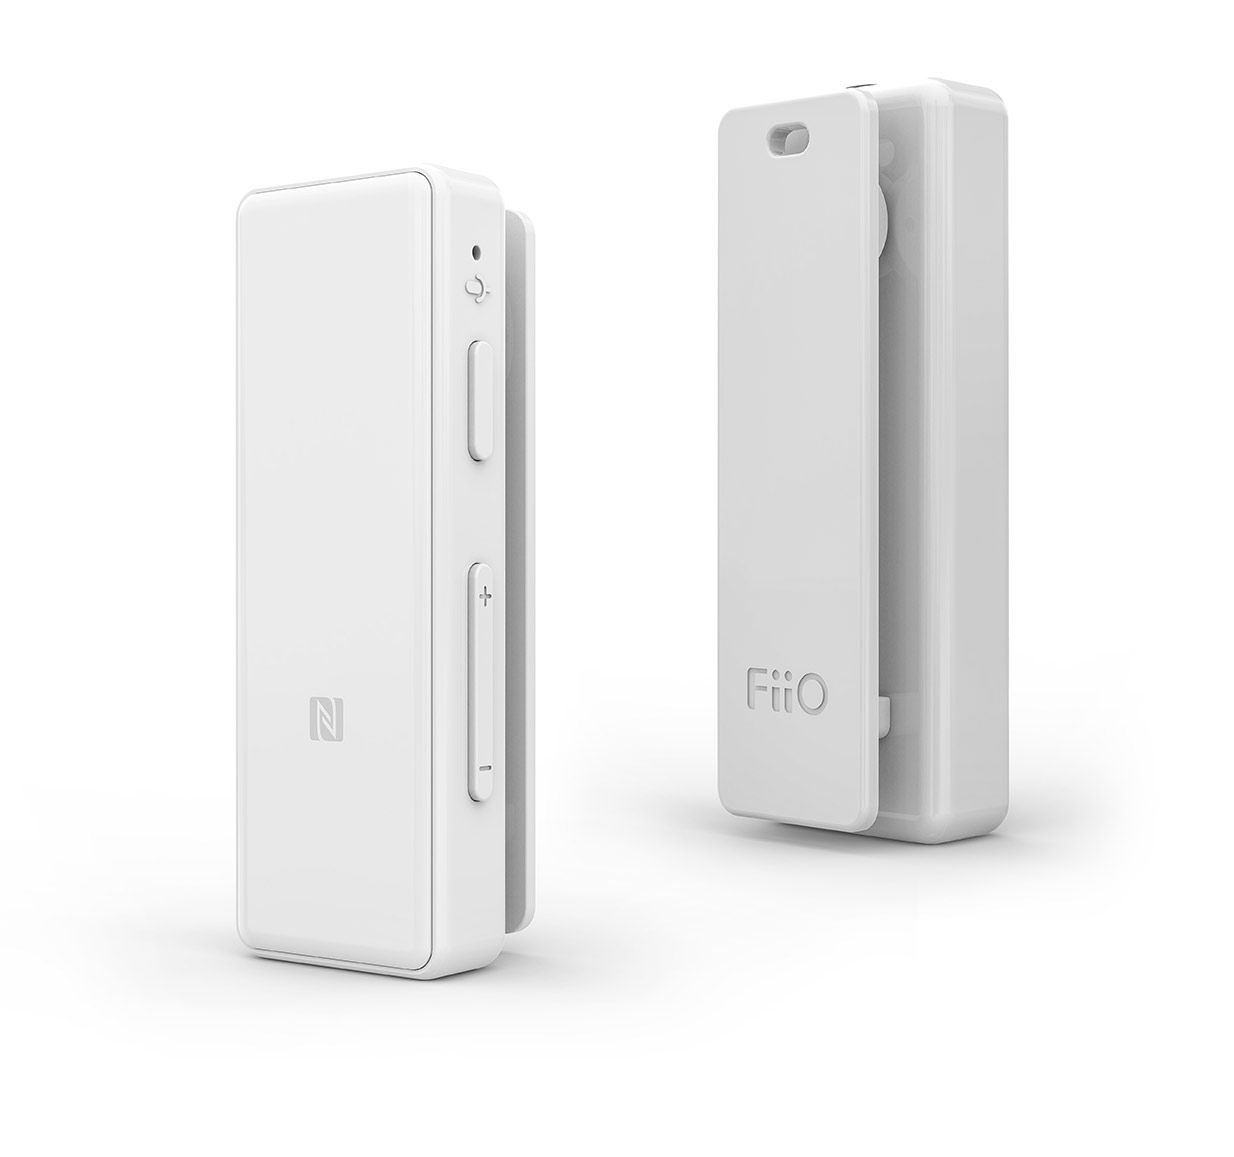 FiiO μBTR Bluetooth Receiver | Gadgetry & Geekery in 2019